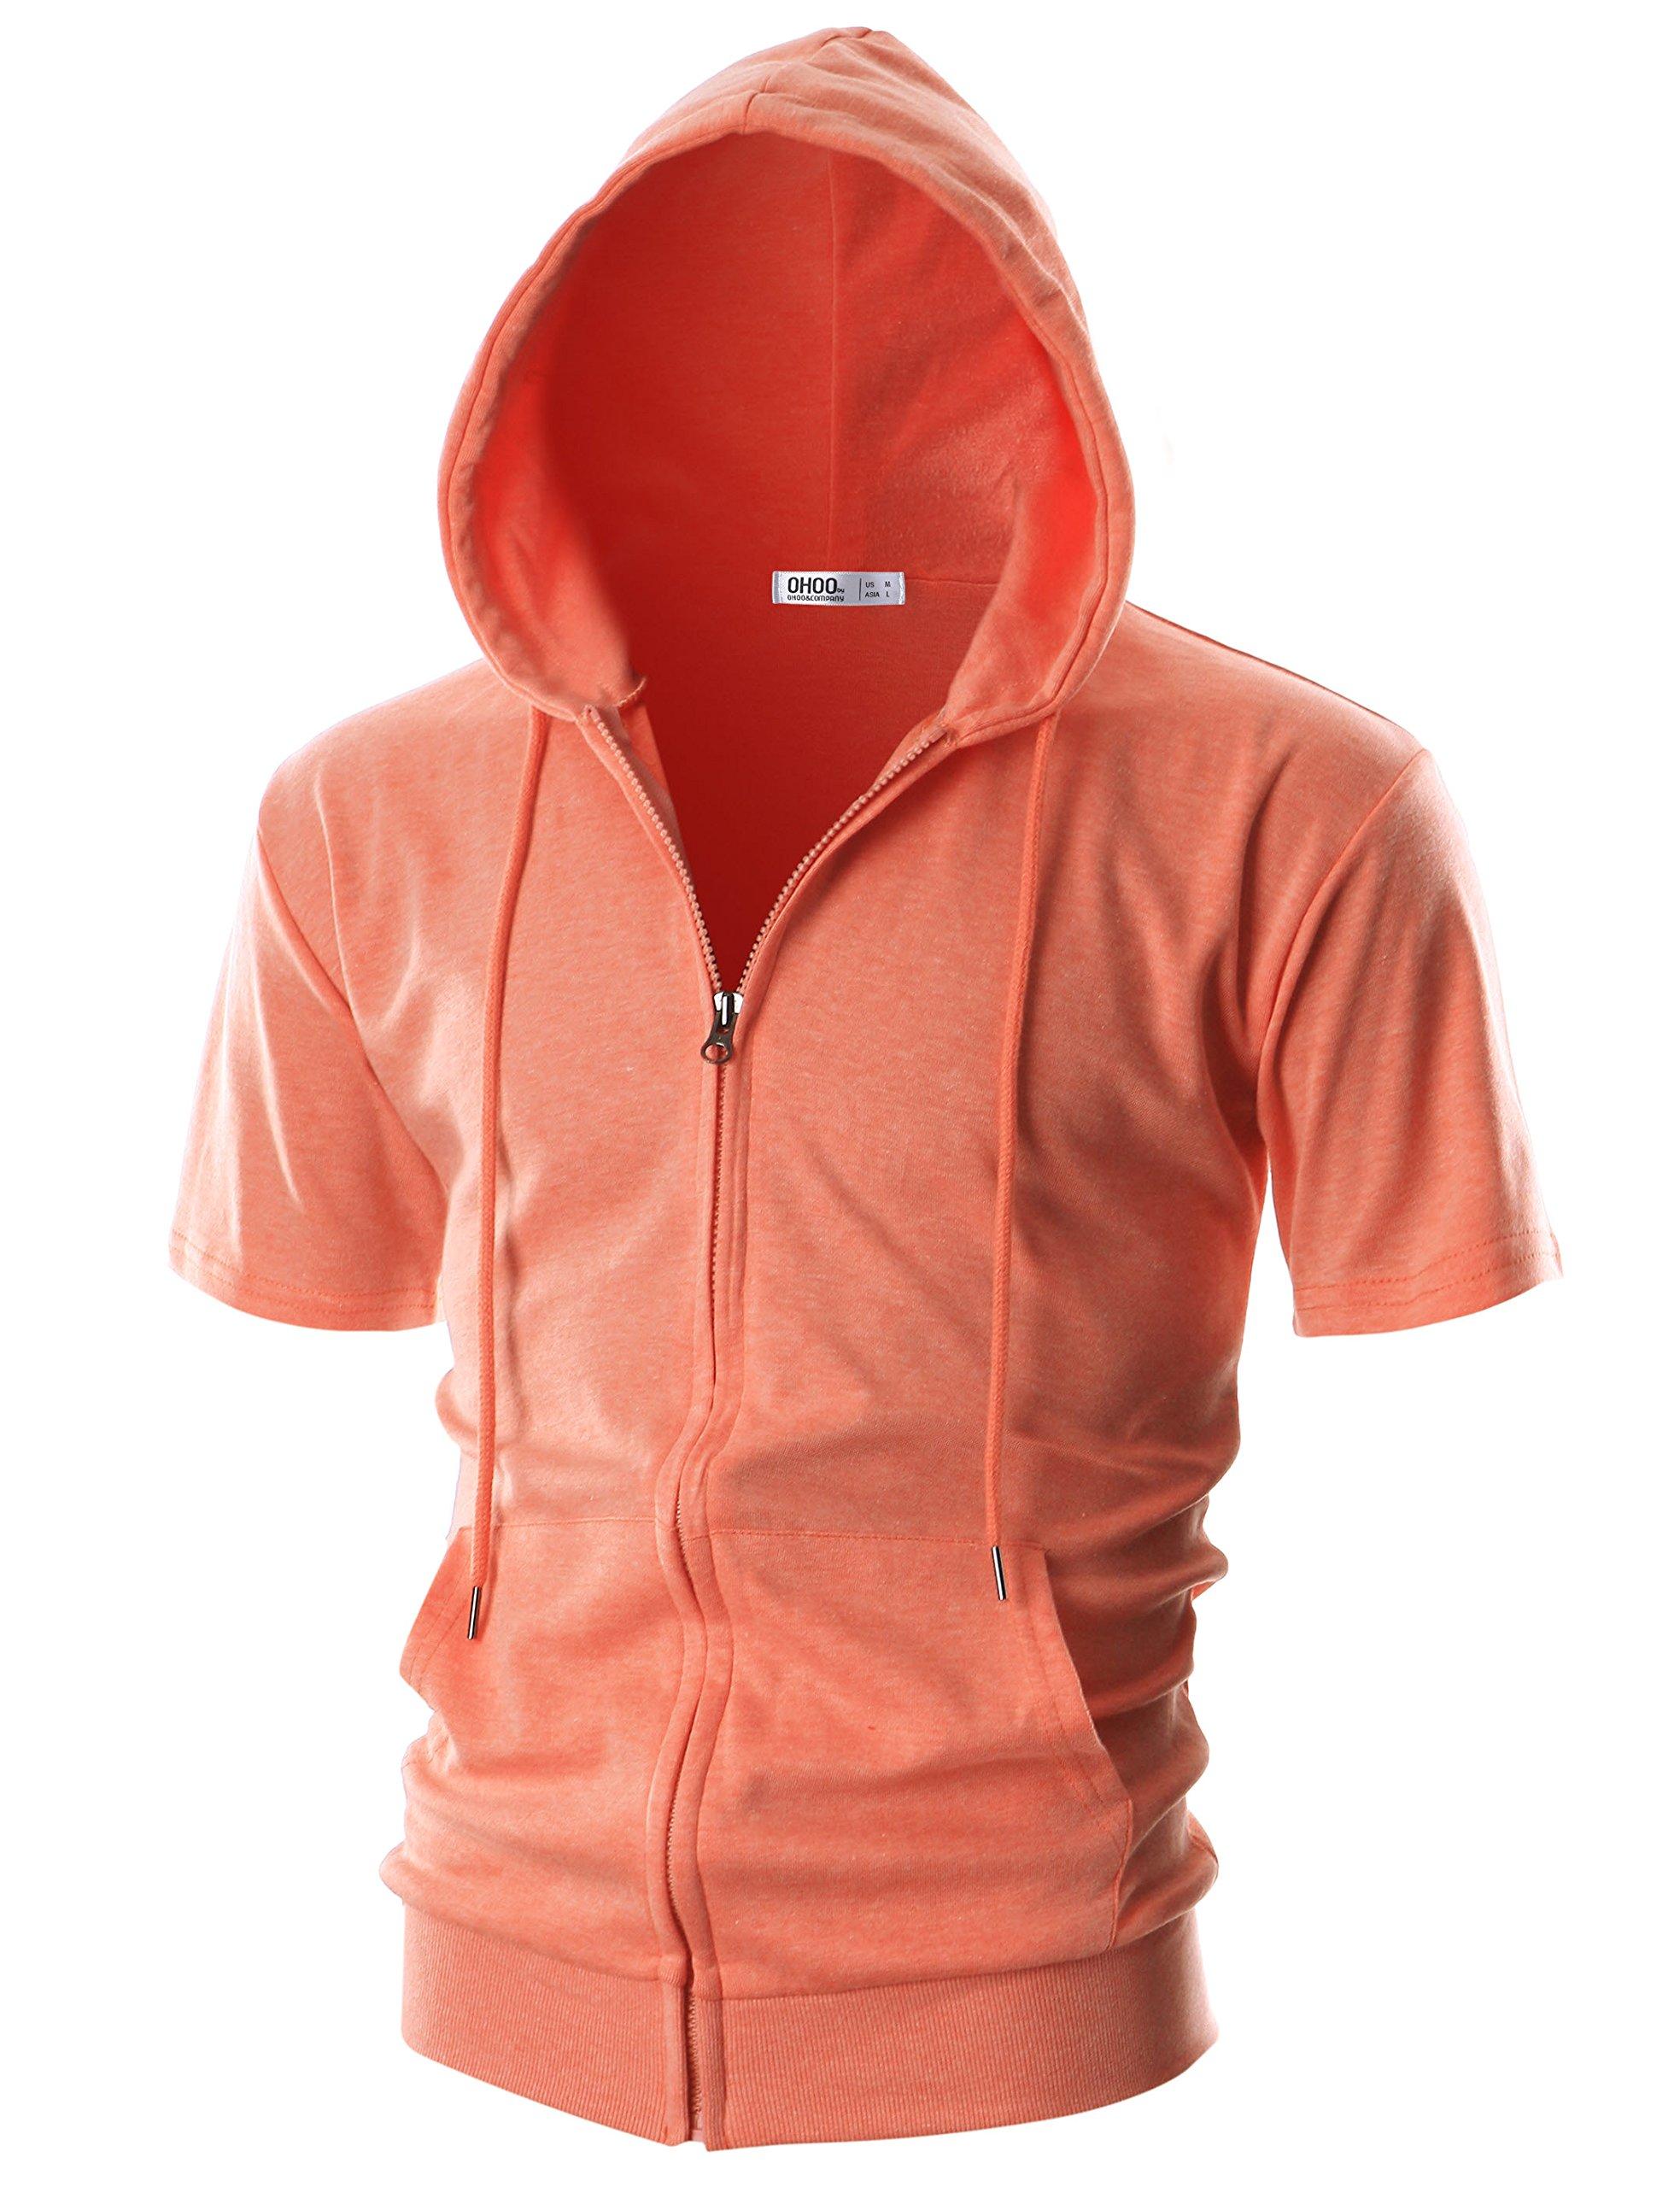 Ohoo Mens Slim Fit Short Sleeve Lightweight One-Tone Zip-up Hoodie with Kanga Pocket/DCF056-ORANGE-XL